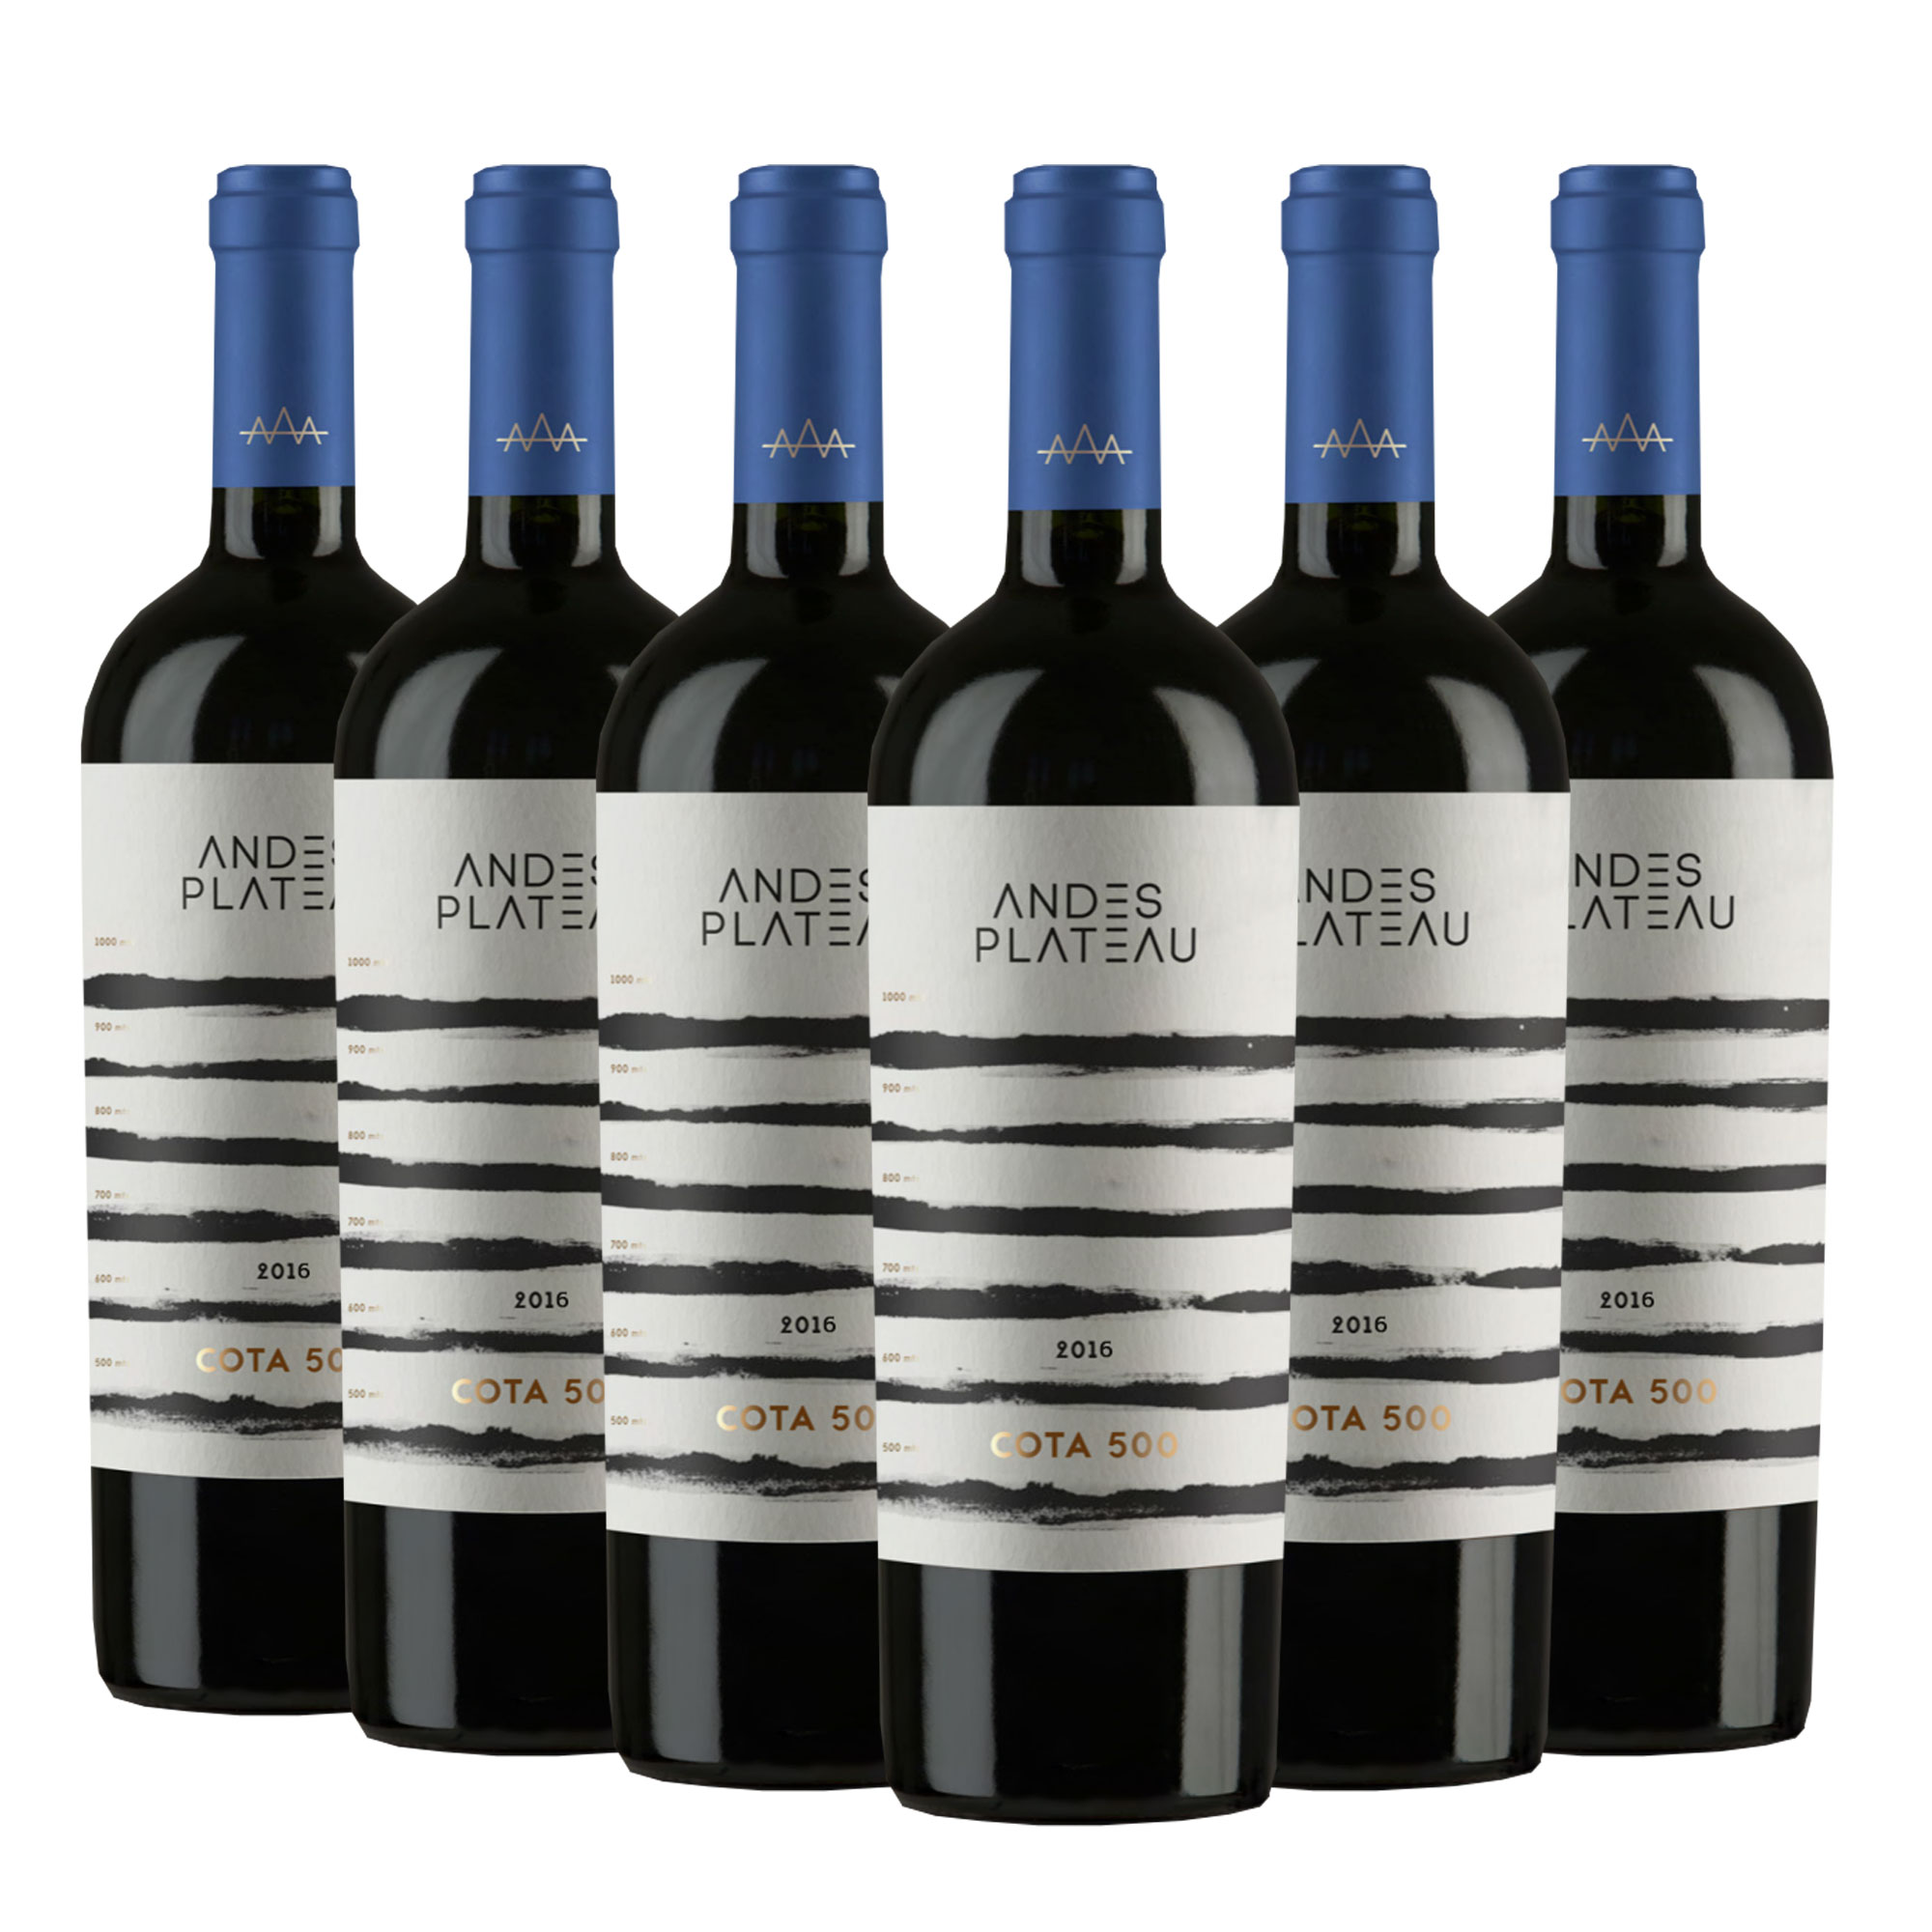 Vinho Cota 500 Andes Plateau Cabernet Sauvignon| 6 Garrafas